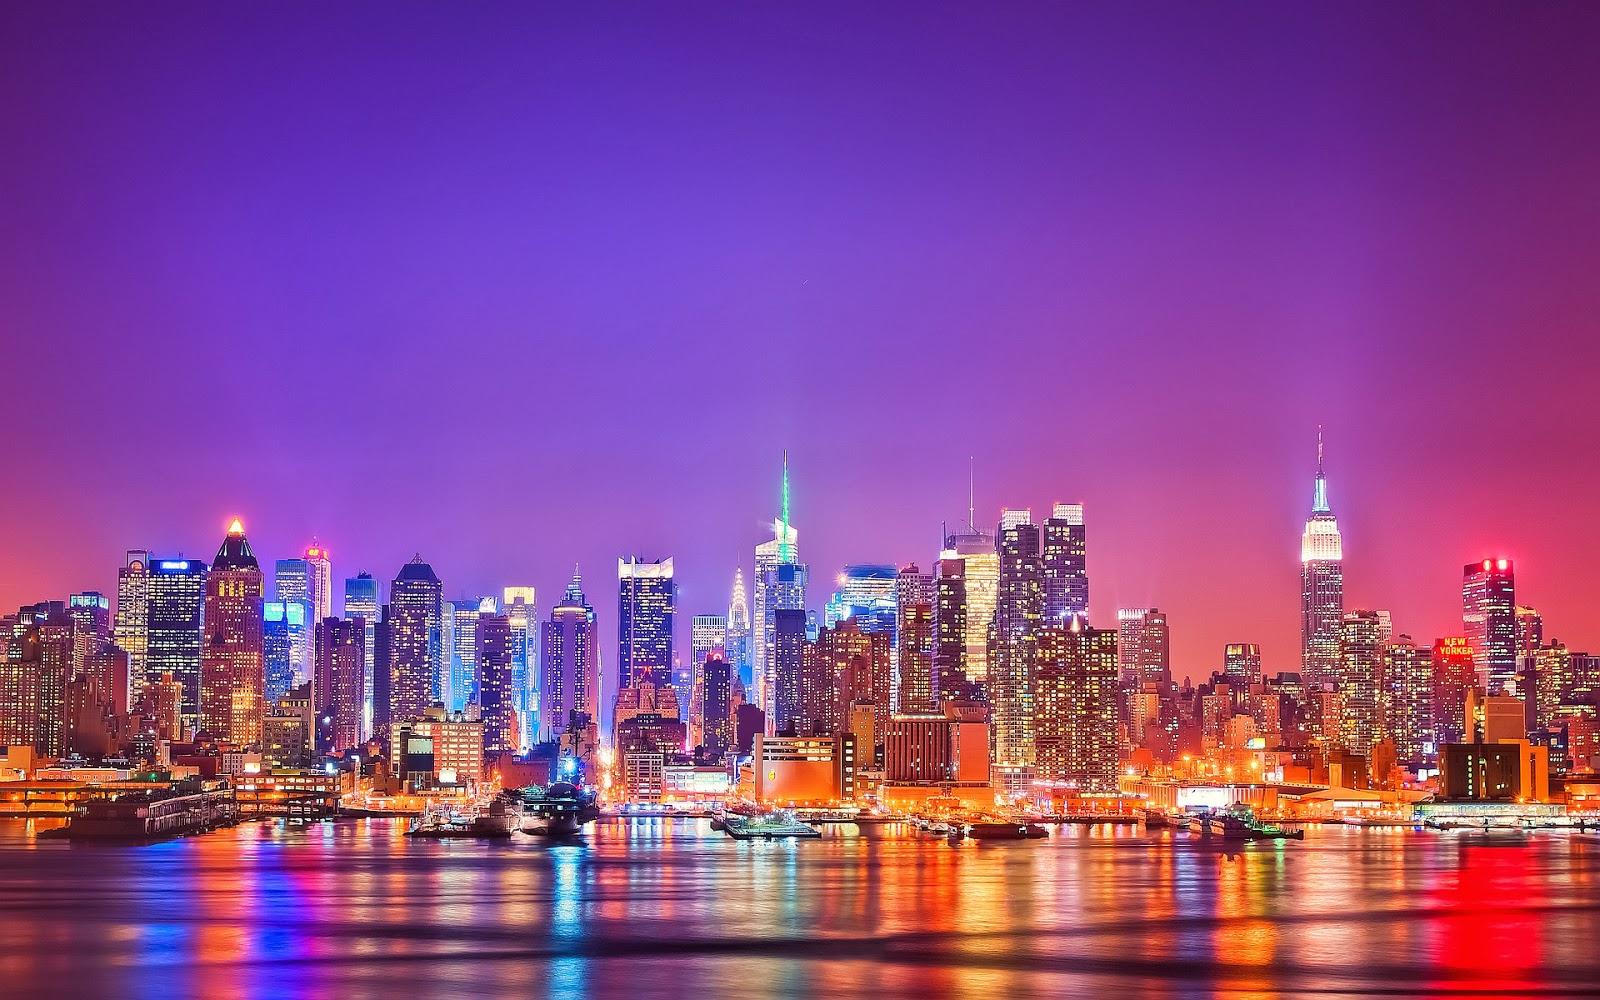 New York City Hd Wallpaper 1600x1000